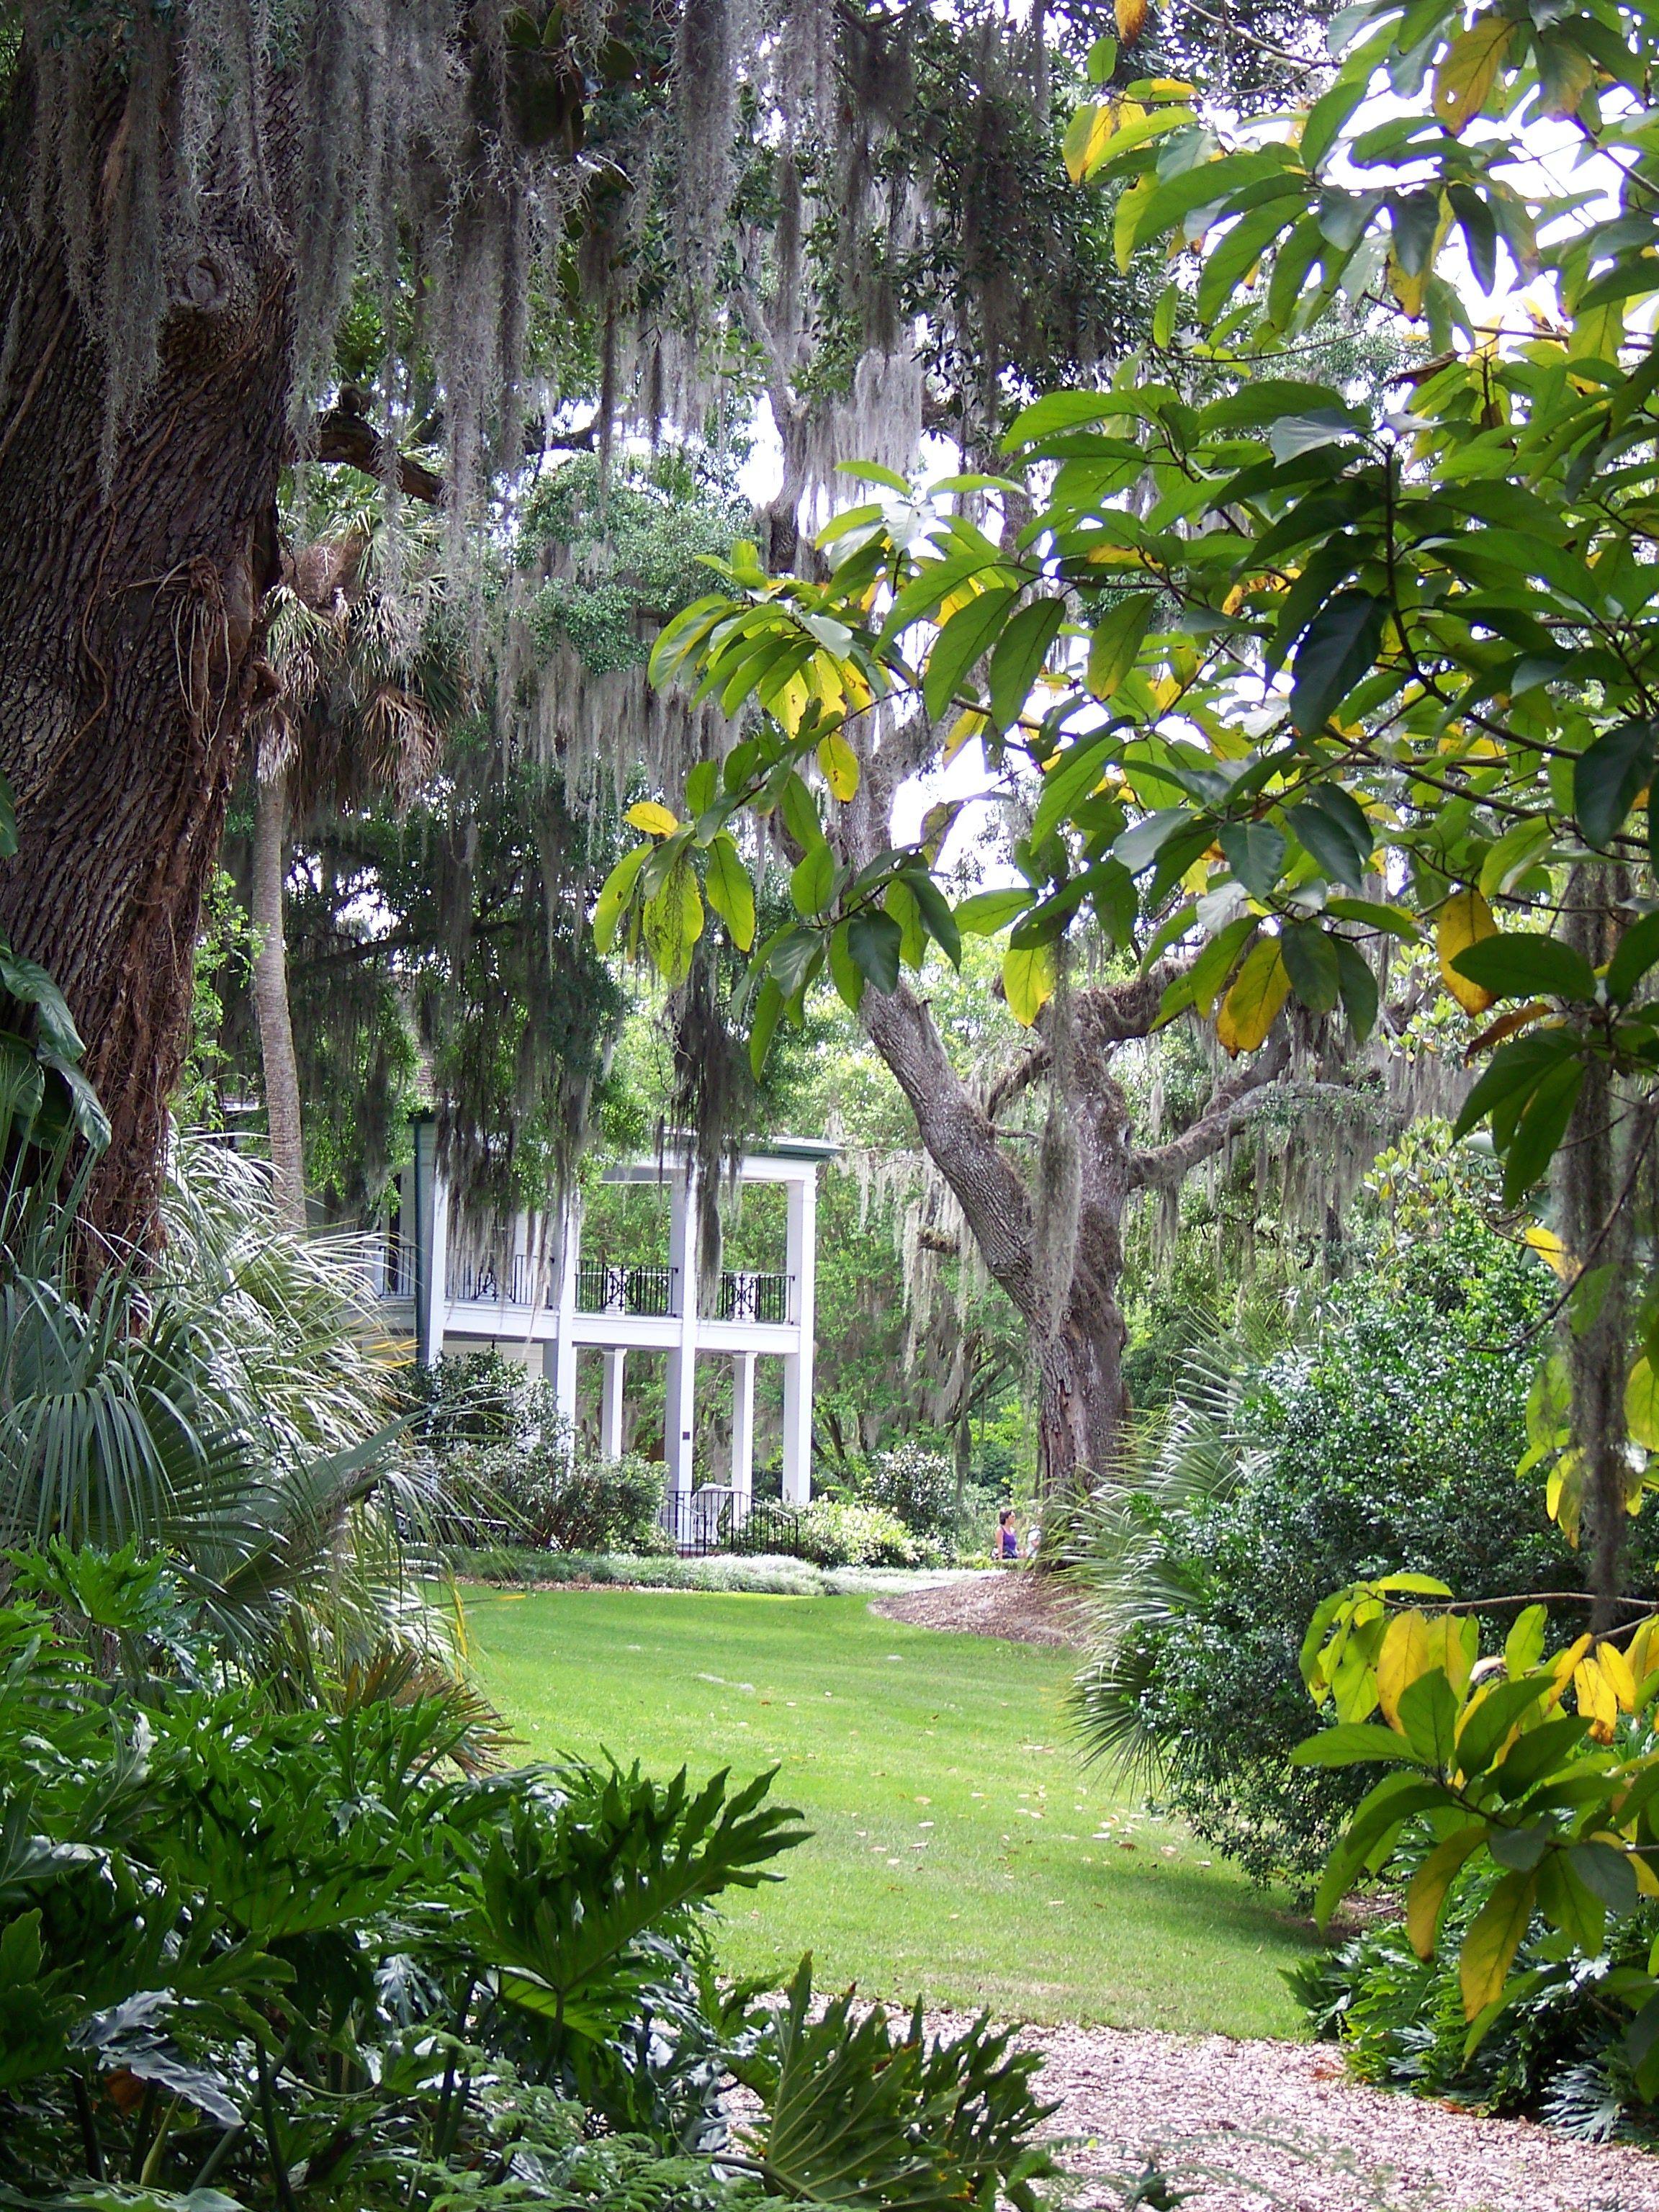 Harry Leu Gardens. Call Ahead Regarding Photo Policies And Availability.